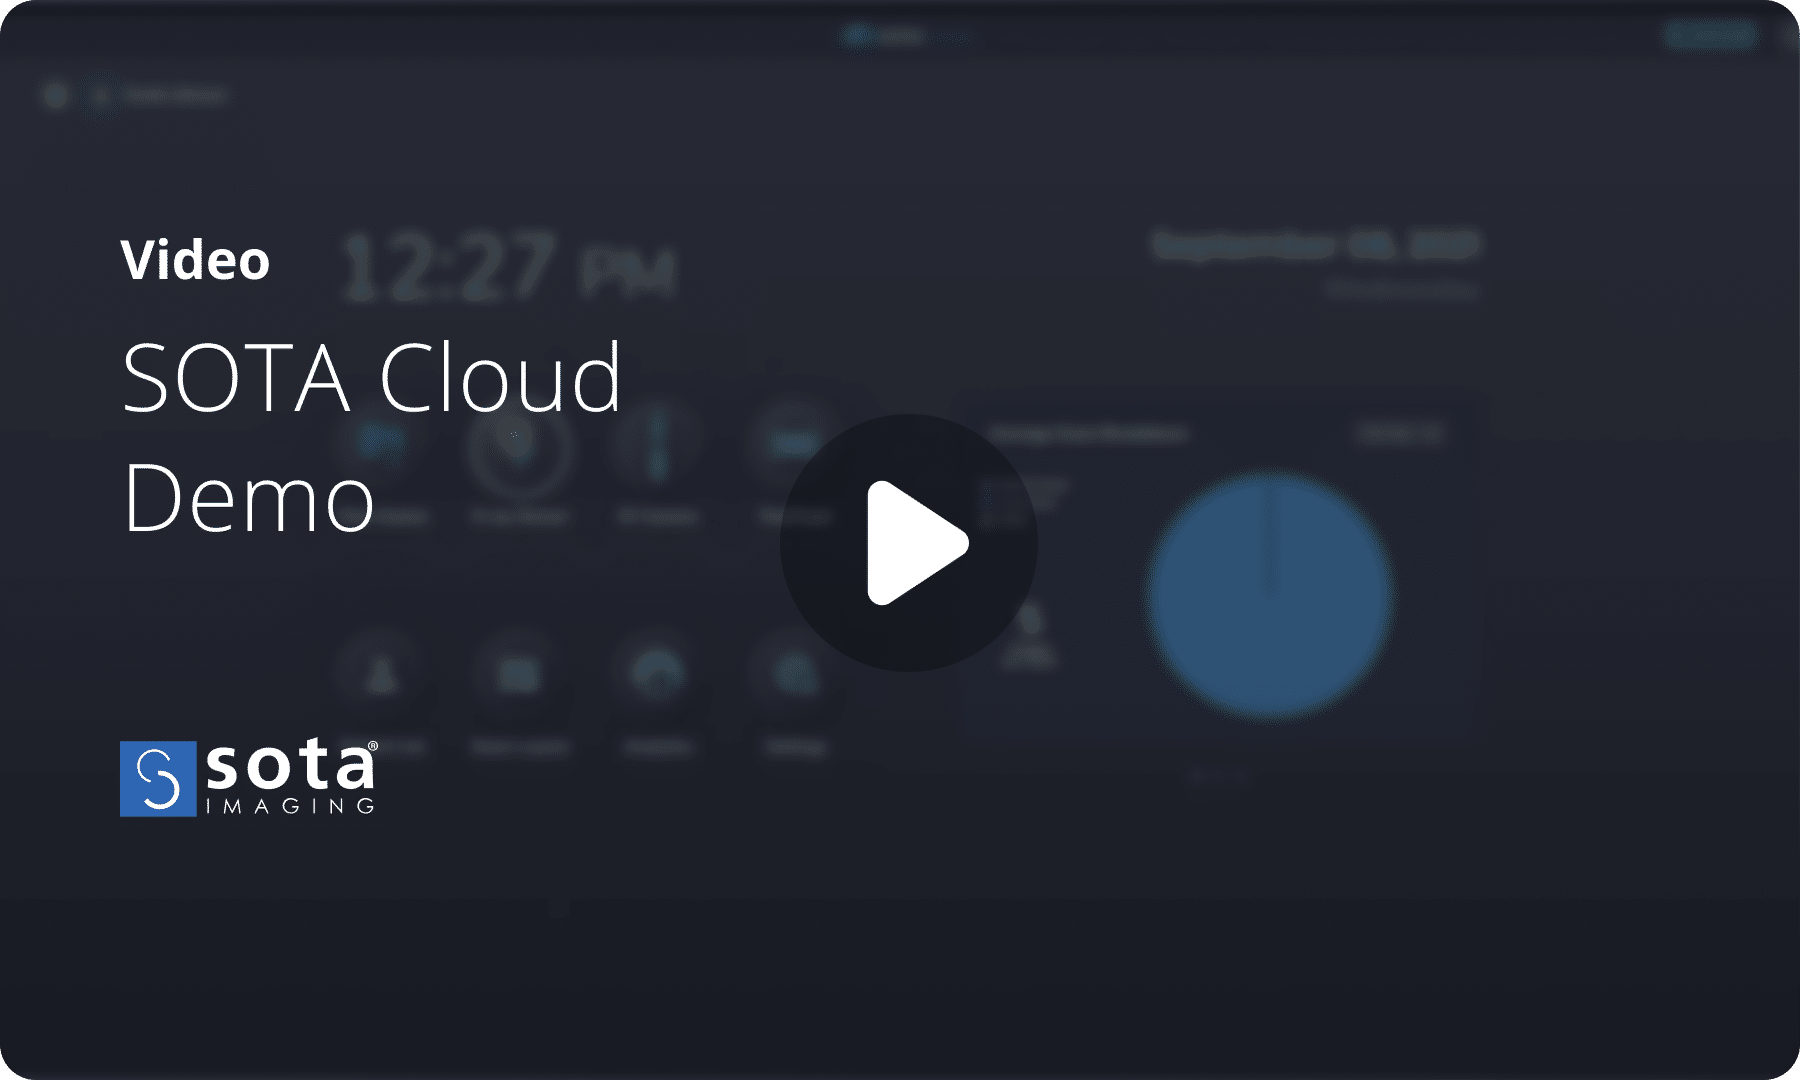 SOTA Cloud demo video